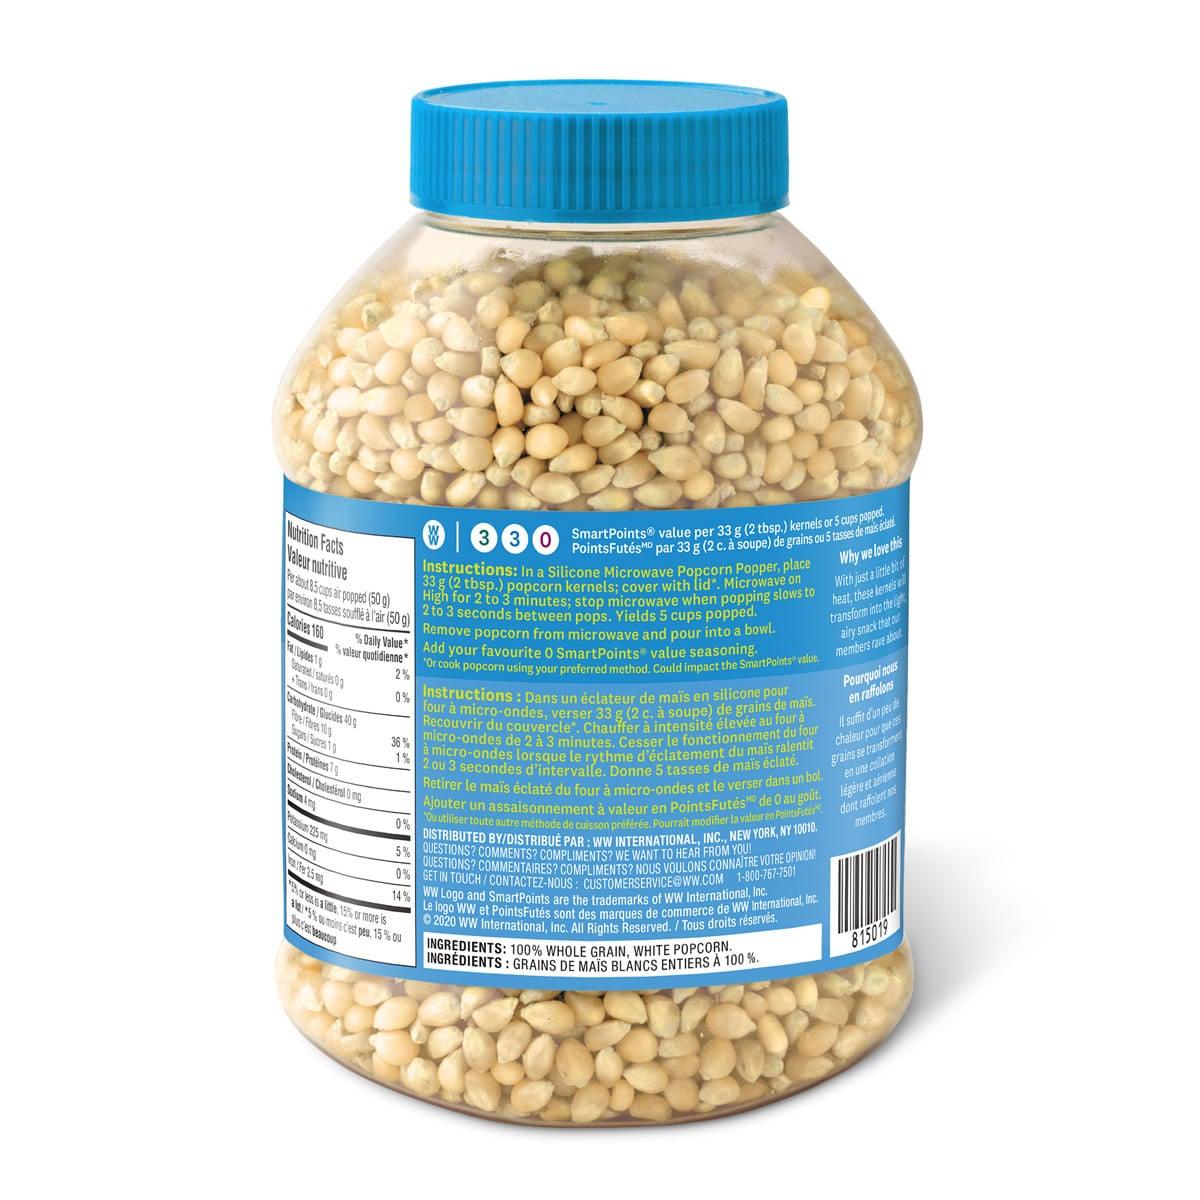 Premium white popcorn kernels - back